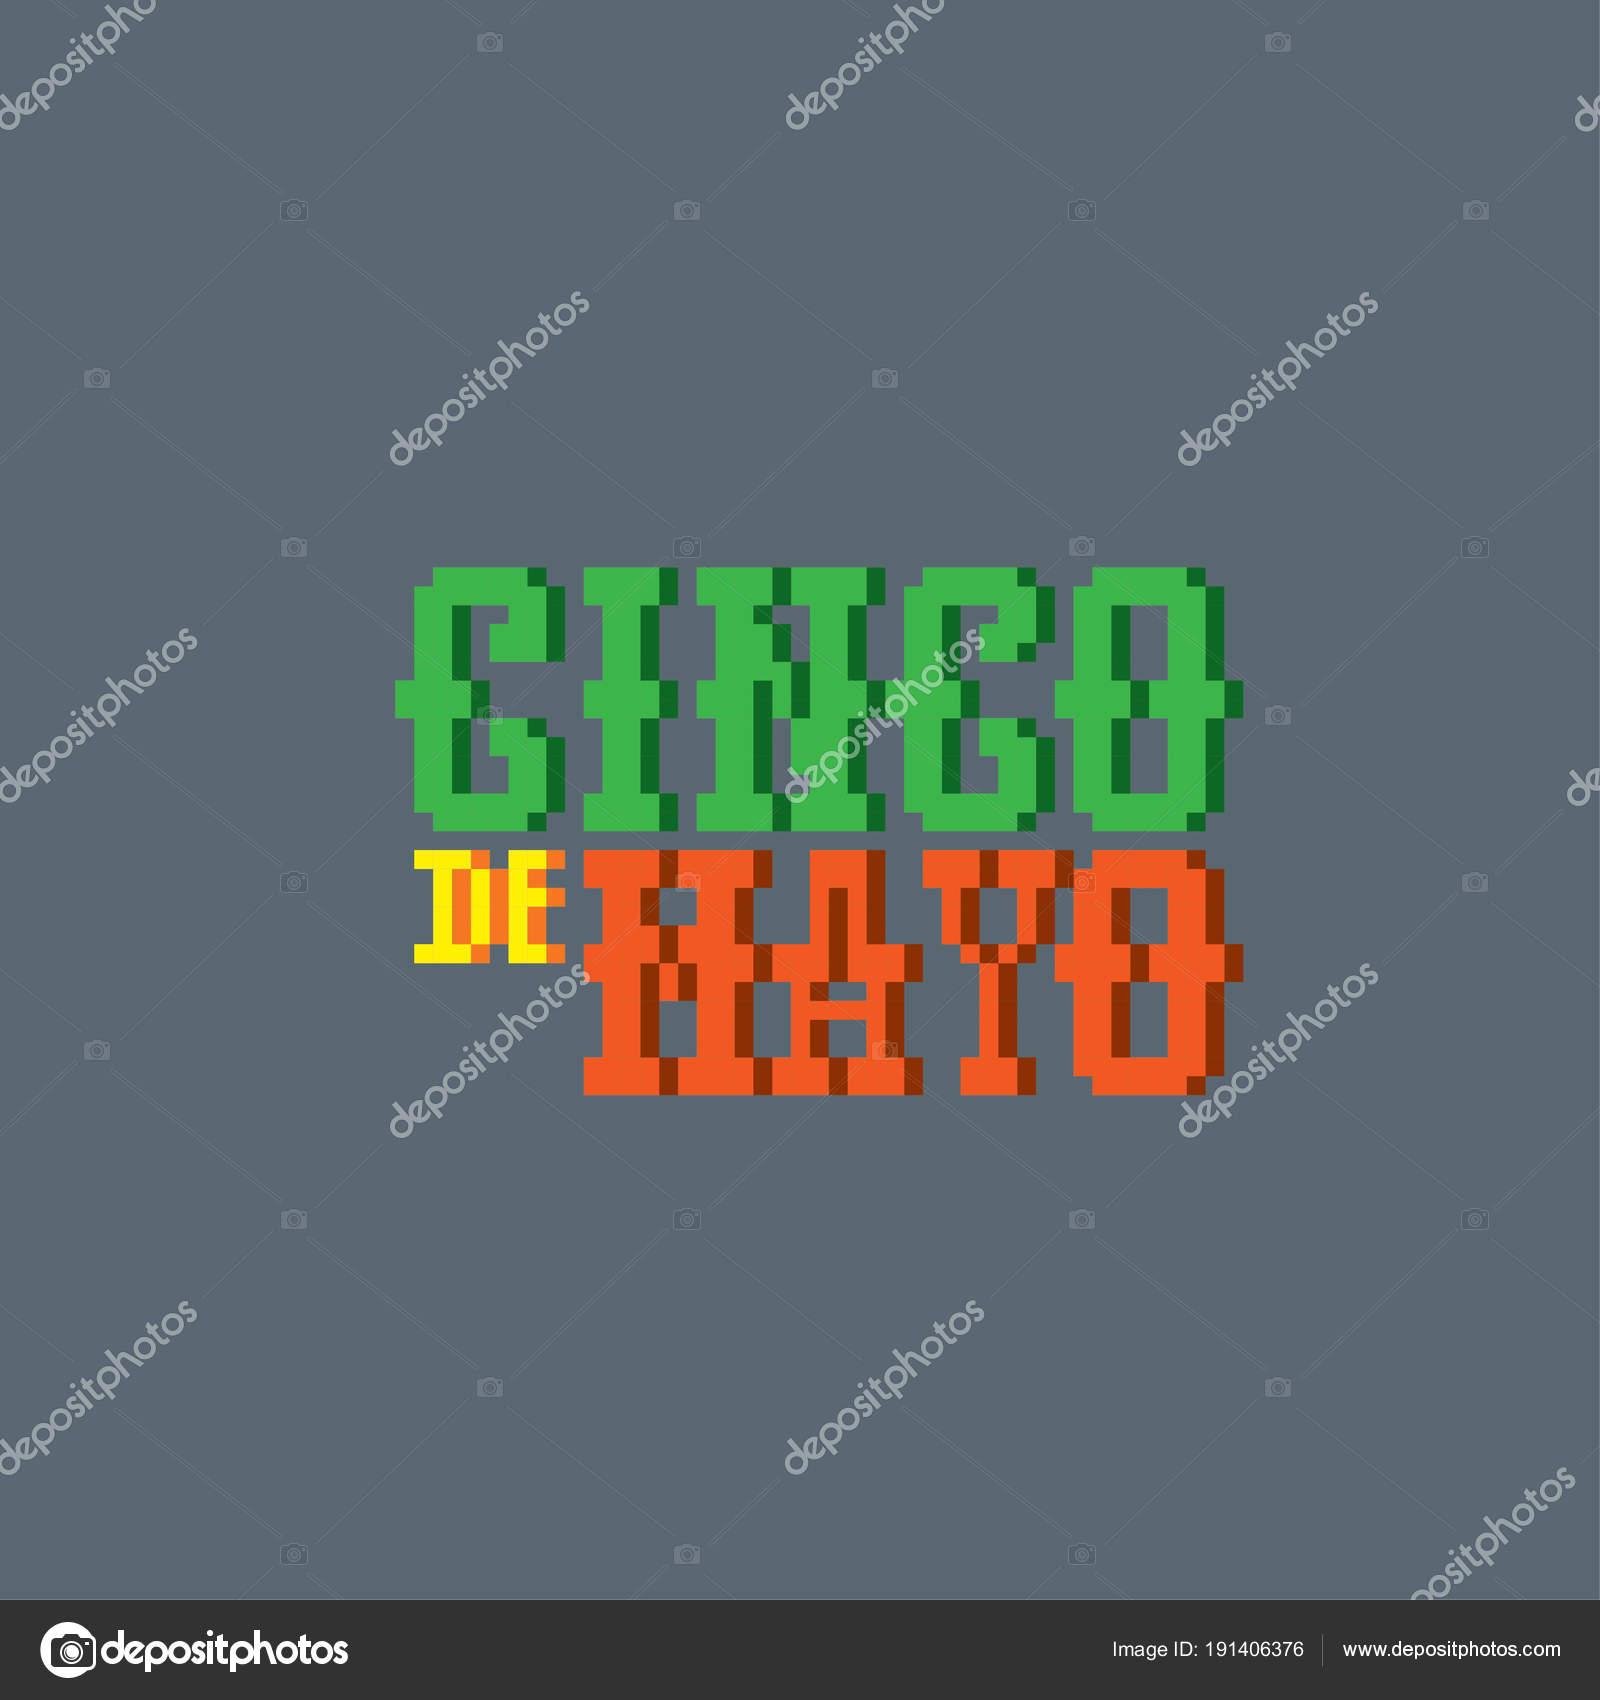 images?q=tbn:ANd9GcQh_l3eQ5xwiPy07kGEXjmjgmBKBRB7H2mRxCGhv1tFWg5c_mWT Pixel Art App Logo @koolgadgetz.com.info